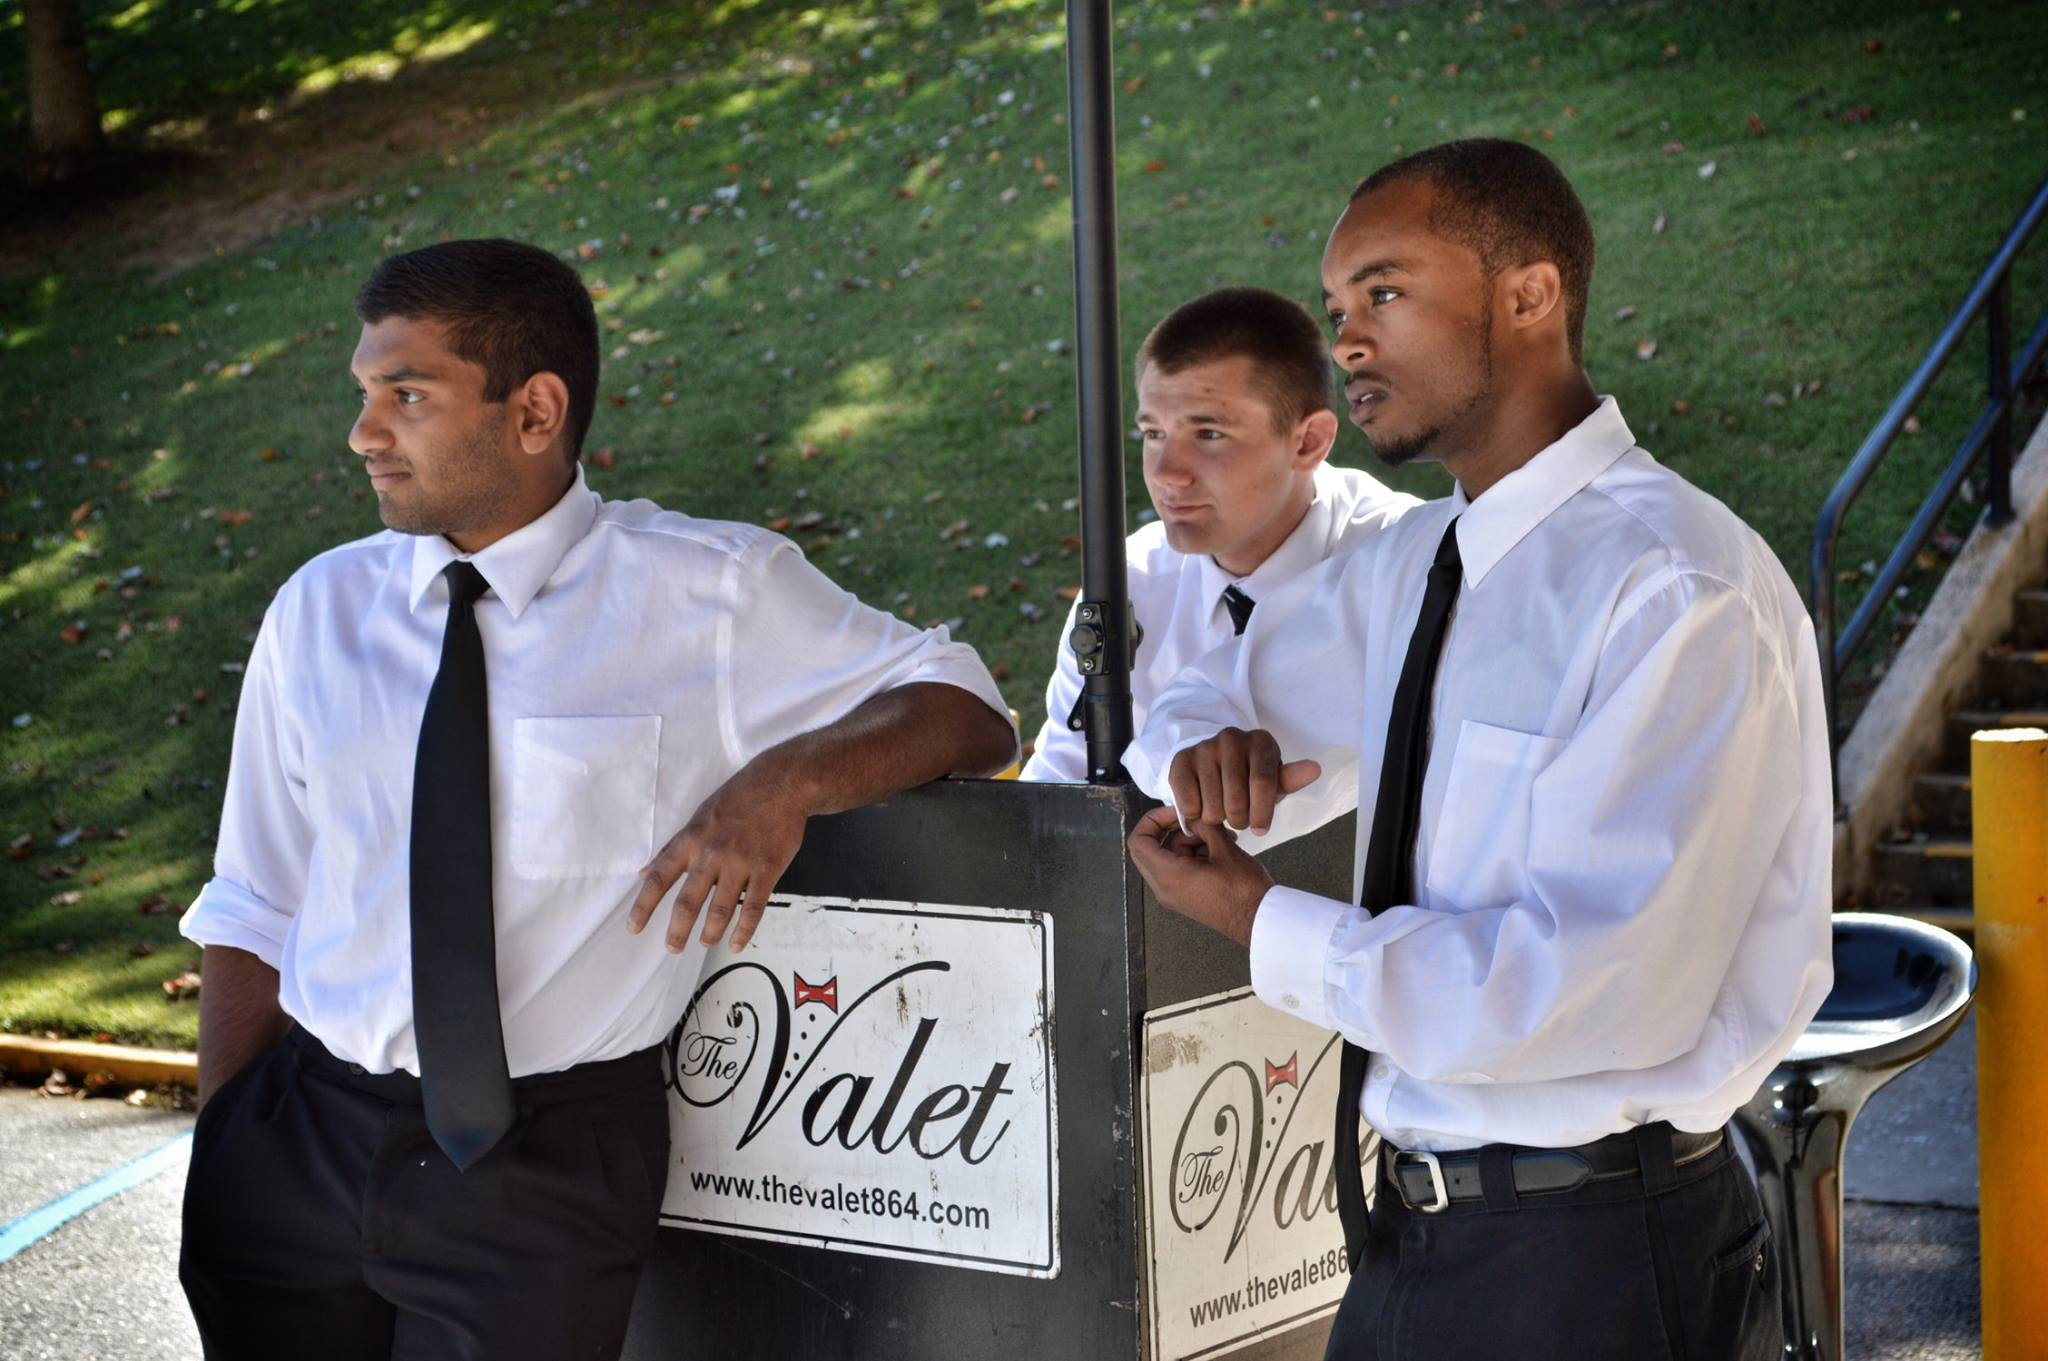 valet-focused